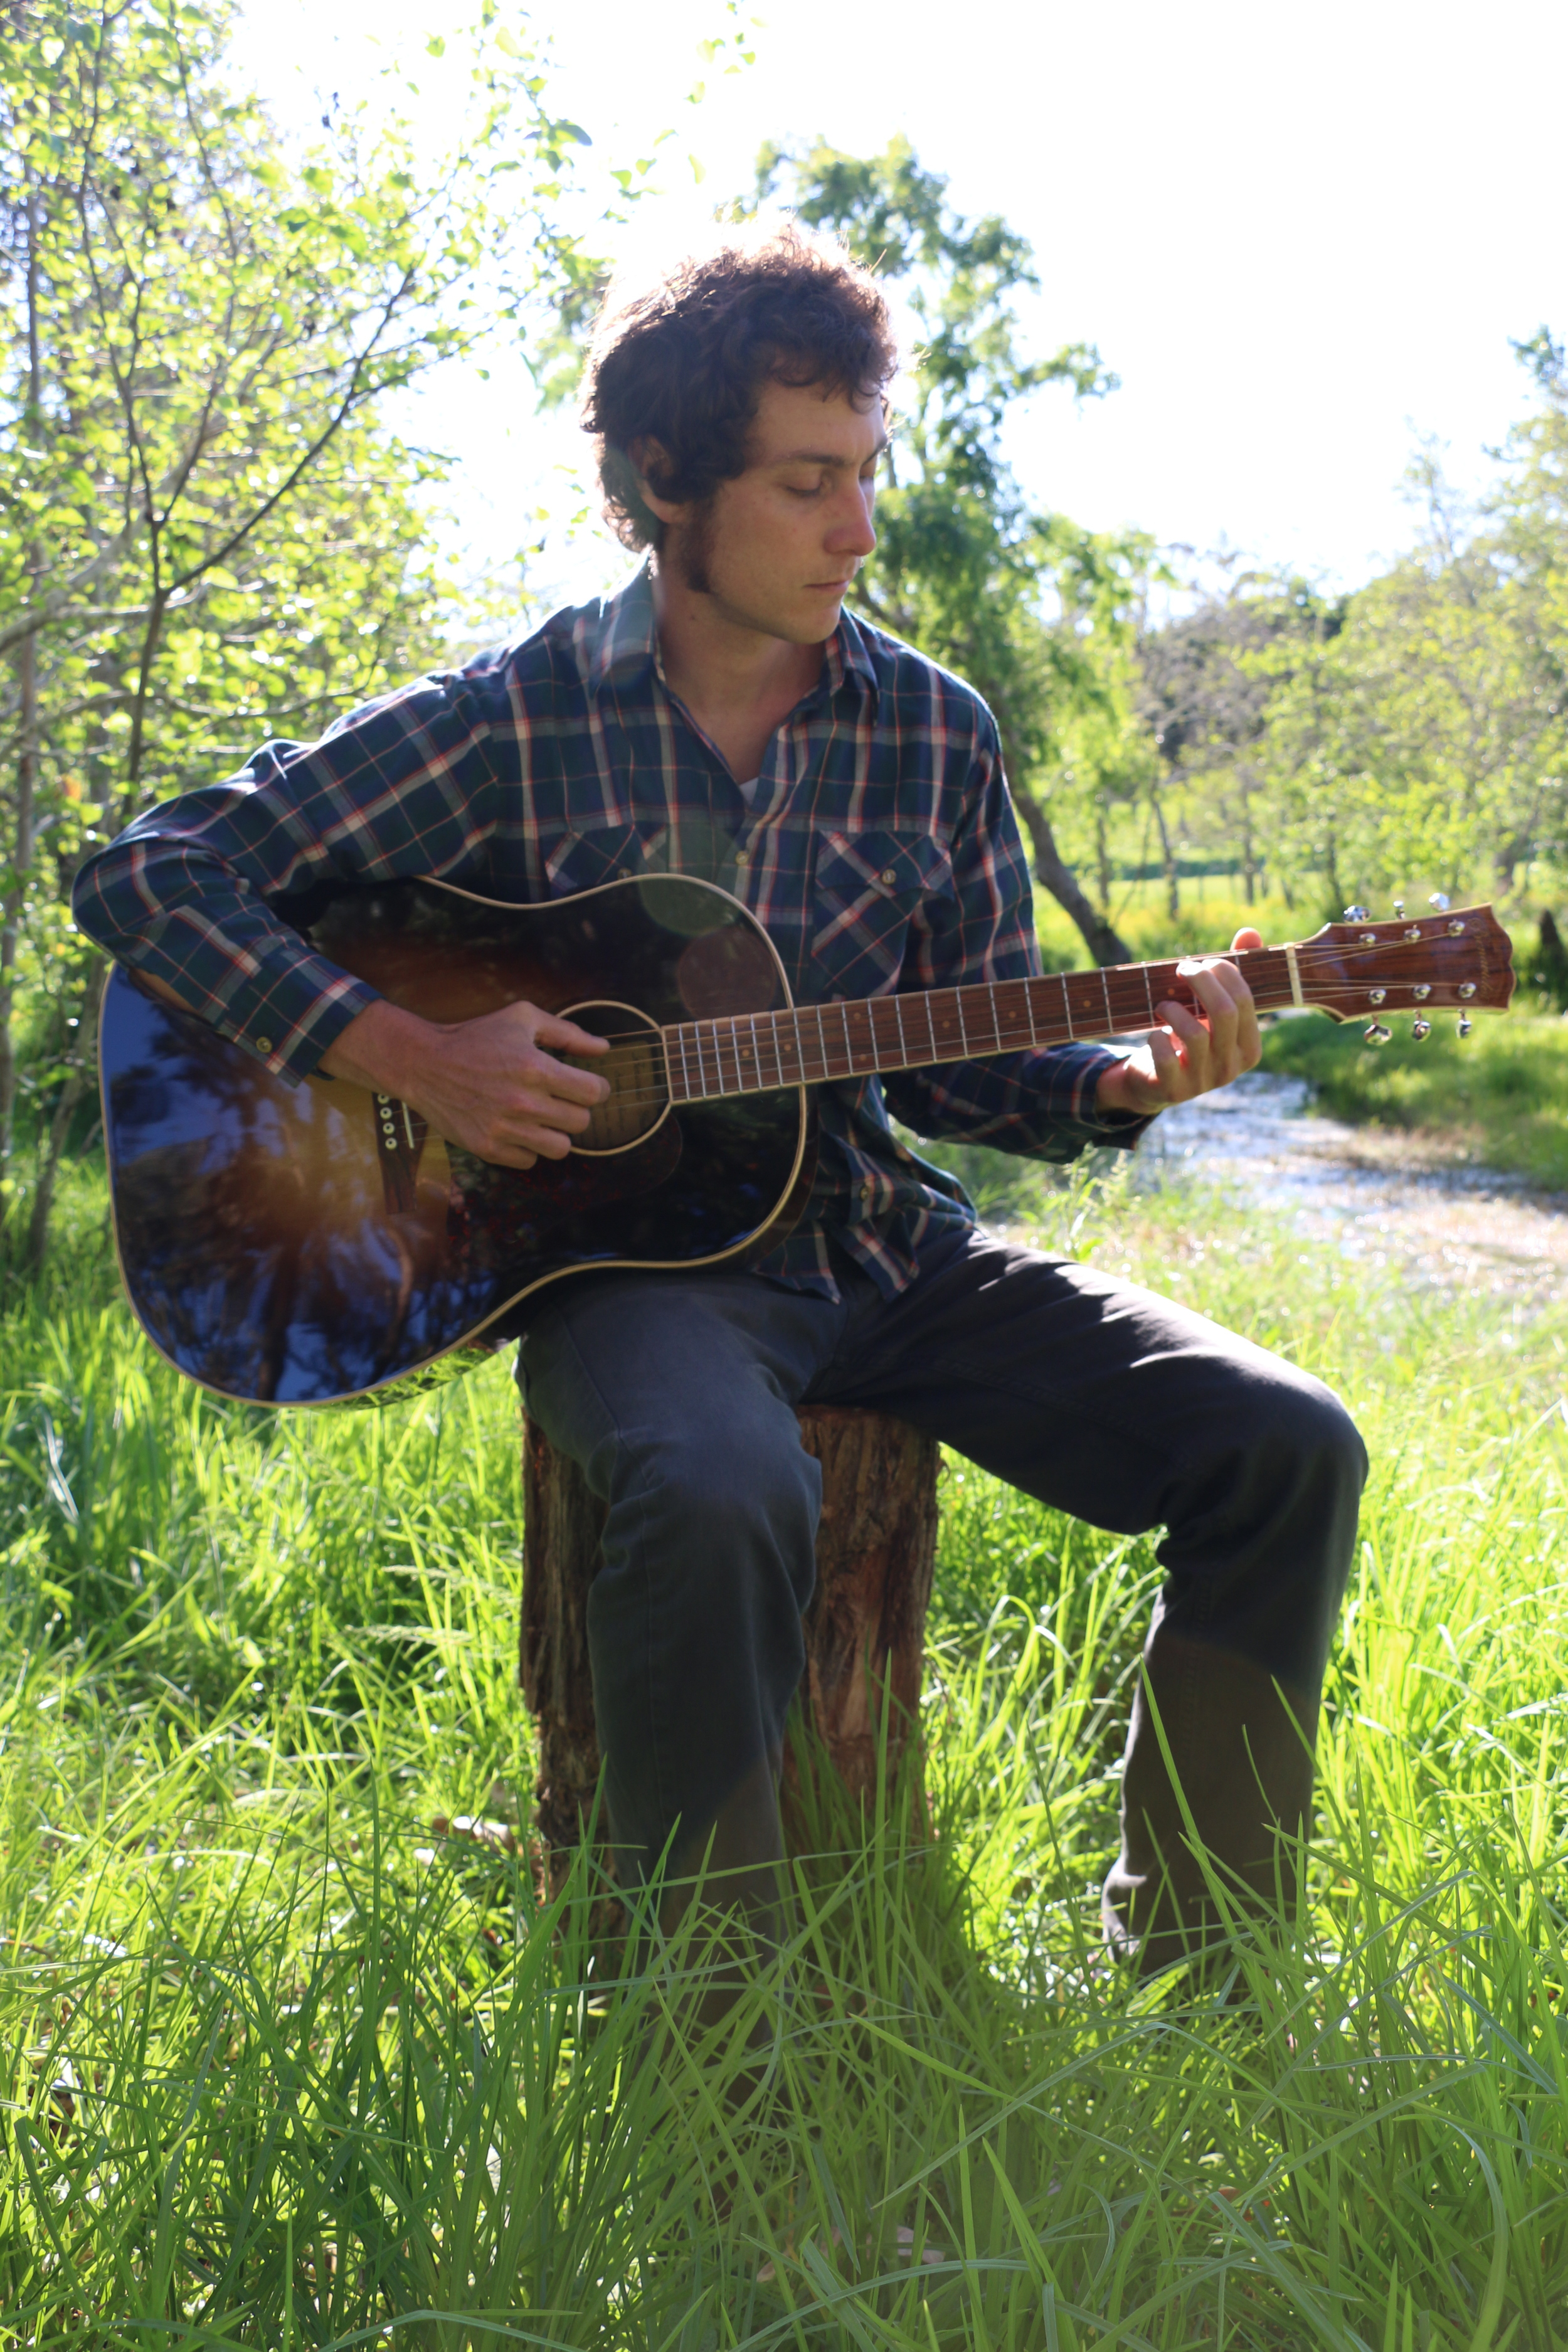 David Benavides playing guitar